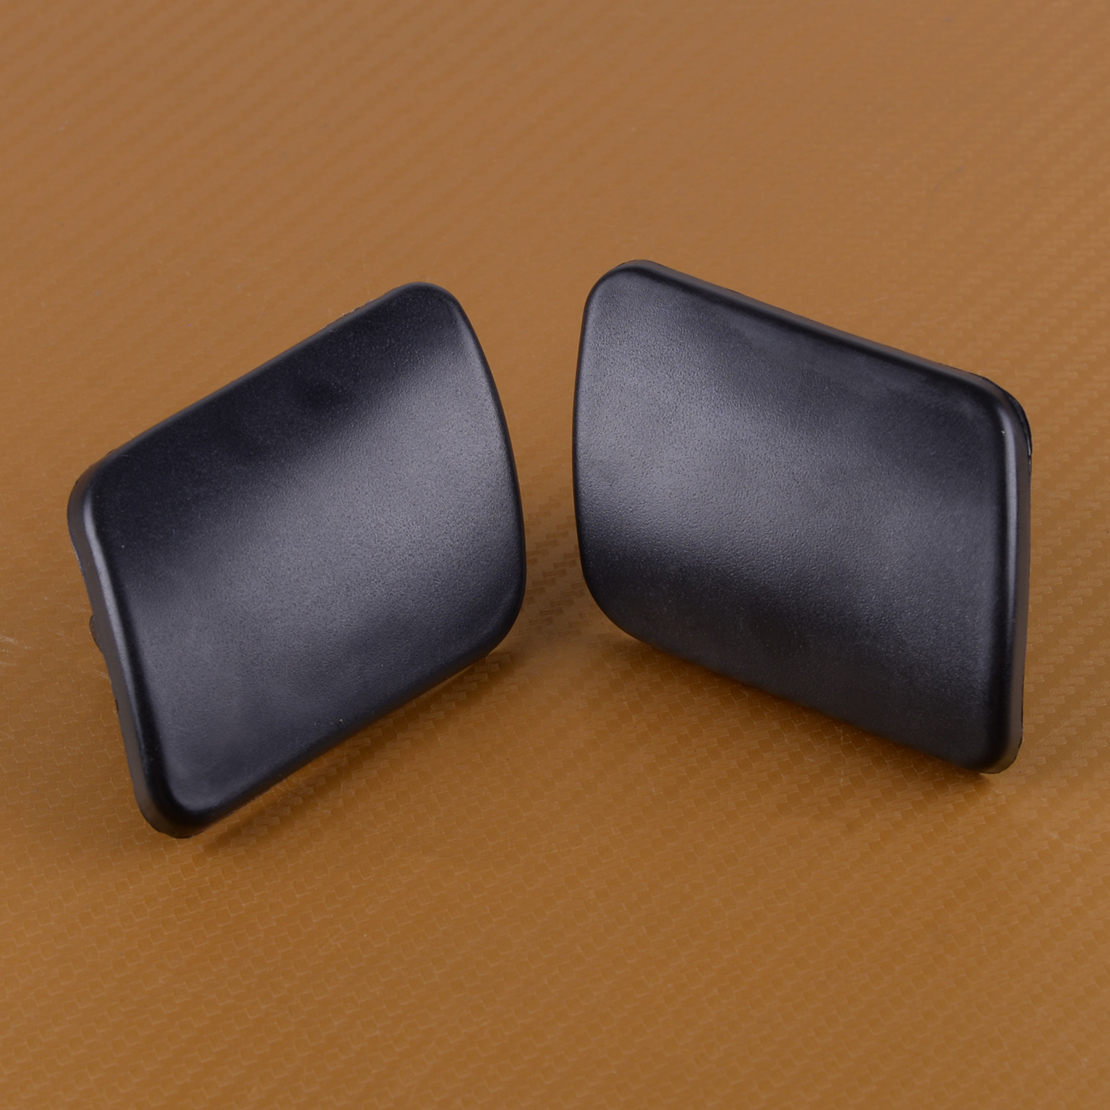 DWCX 2PCS Plastic Car Headlight Washer Nozzle Cover Cap Fit For VW Golf 4 IV Mk4 1998 1999 2000 2001 2002 2003 2004 2005 2006